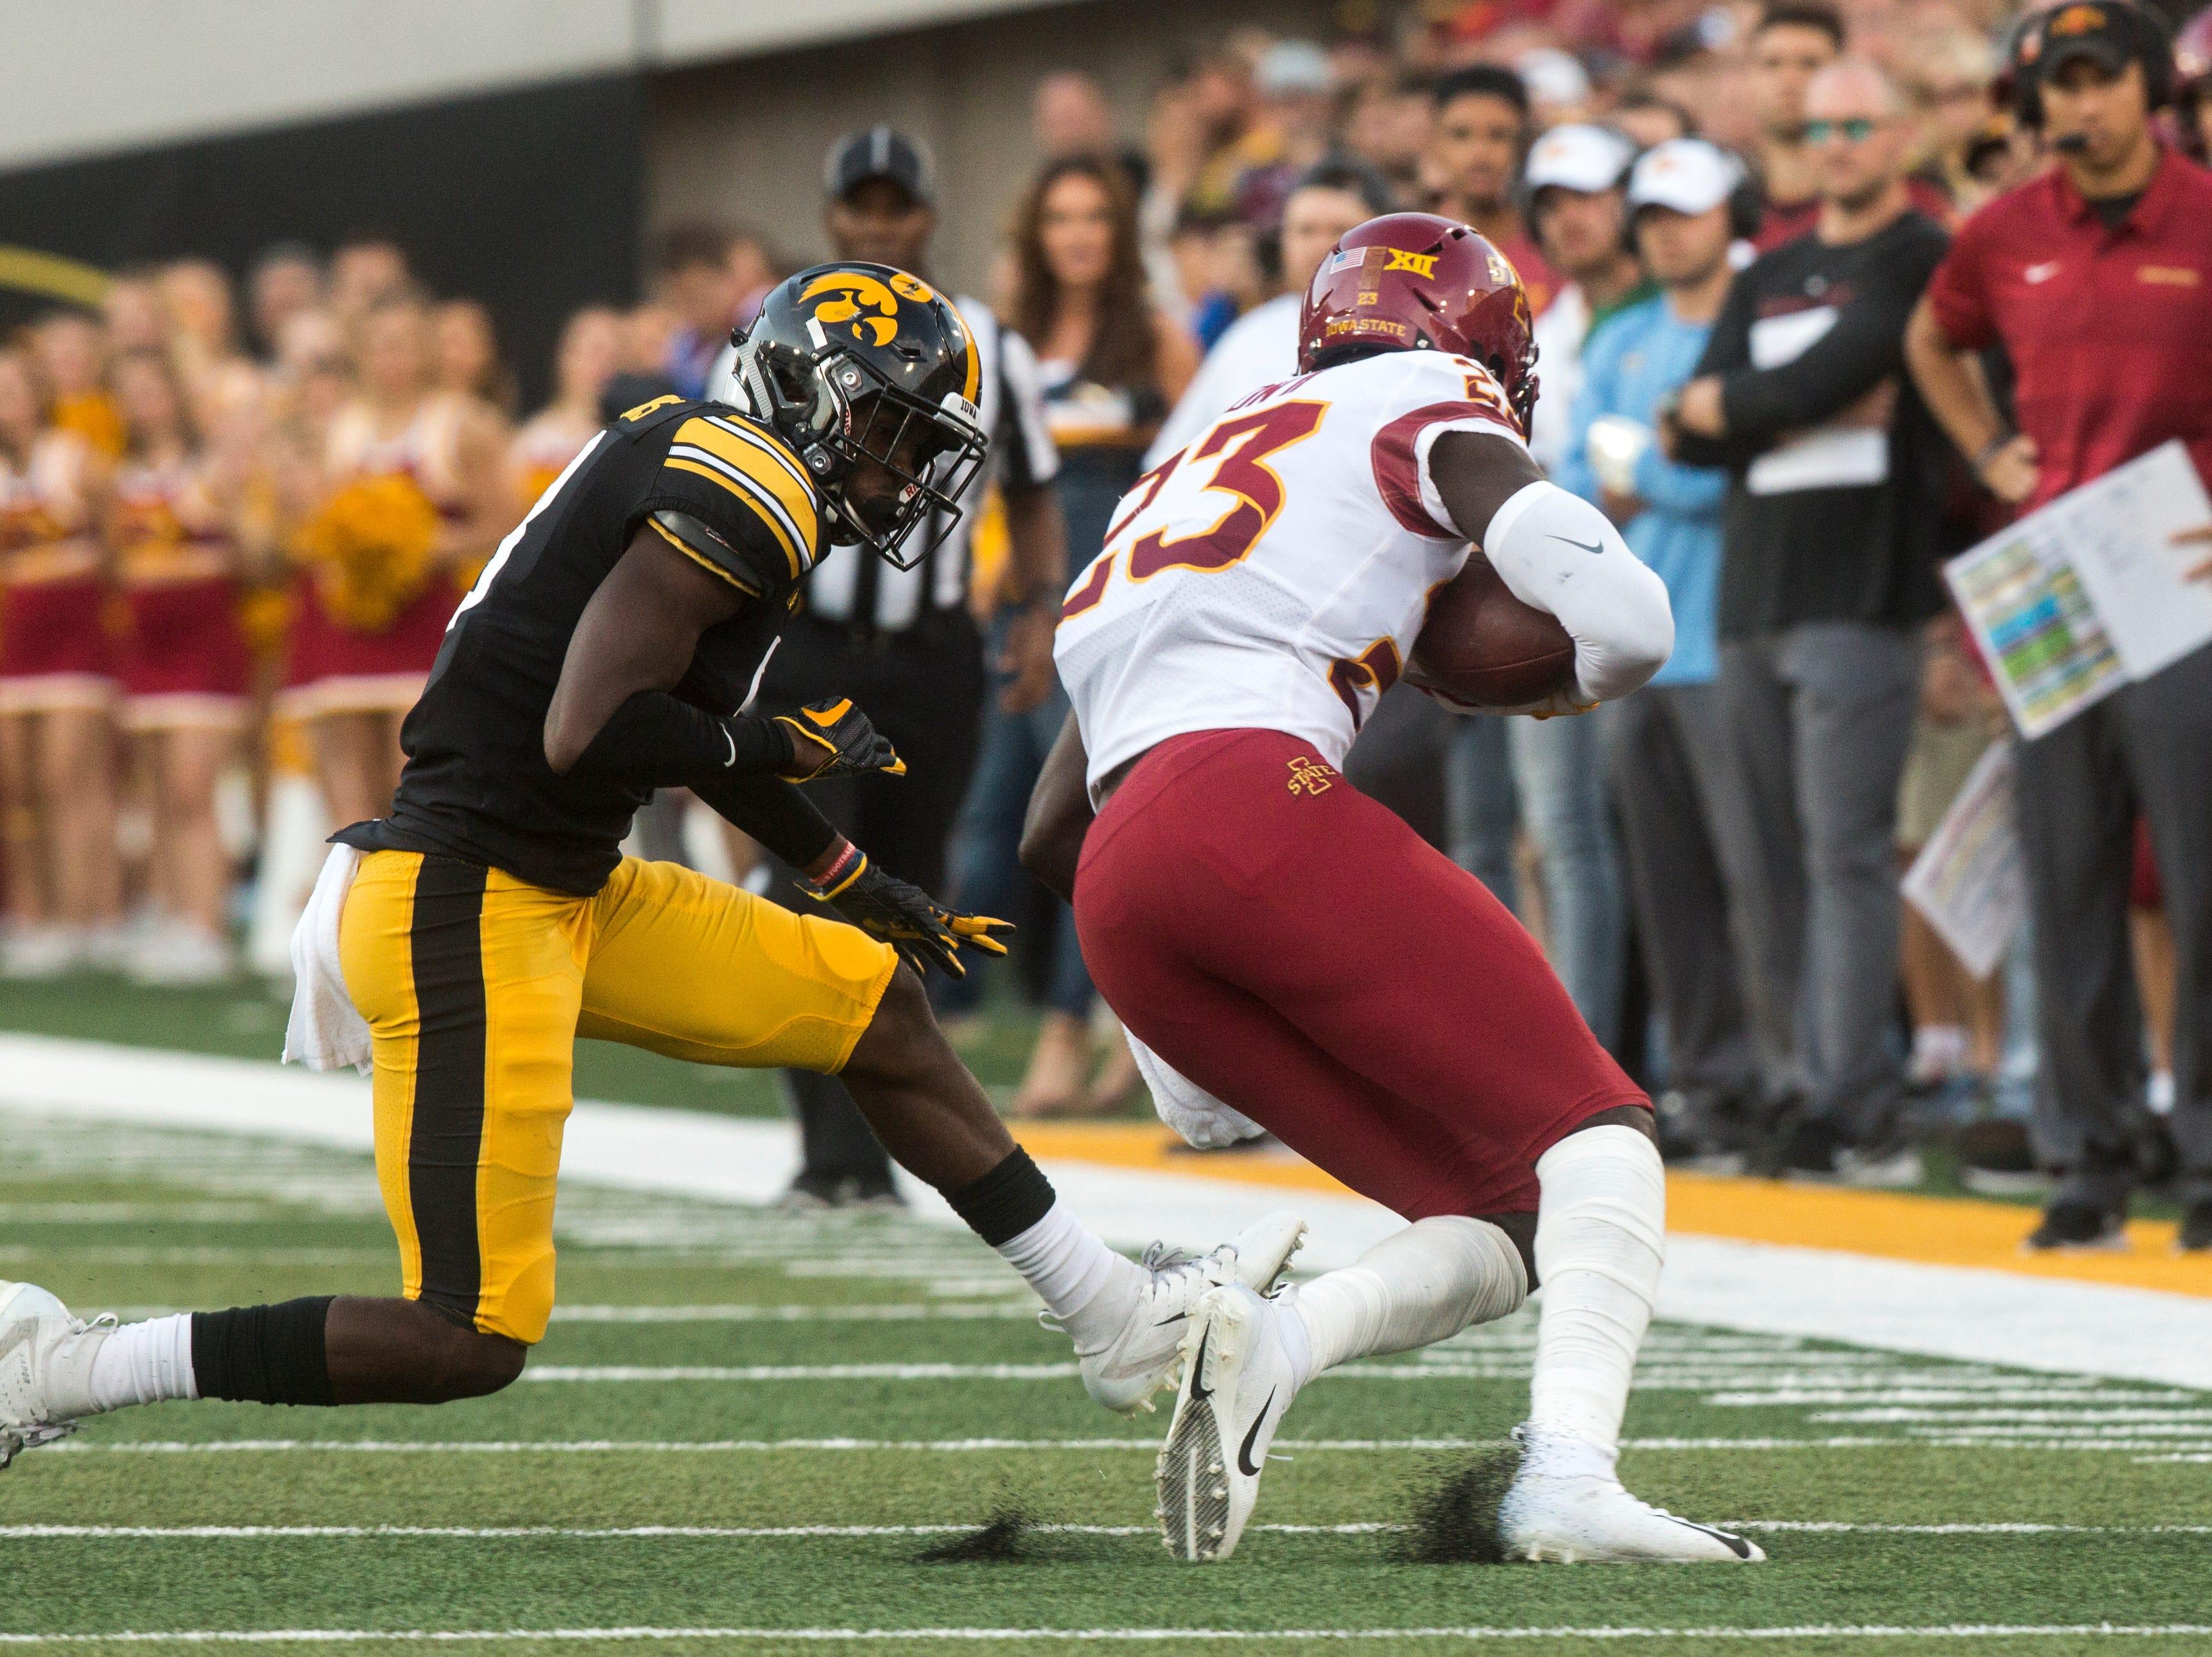 Iowa defensive back Matt Hankins (8) tackles Iowa State wide receiver Matthew Eaton (23) during the Cy-Hawk NCAA football game on Saturday, Sept. 8, 2018, at Kinnick Stadium in Iowa City.